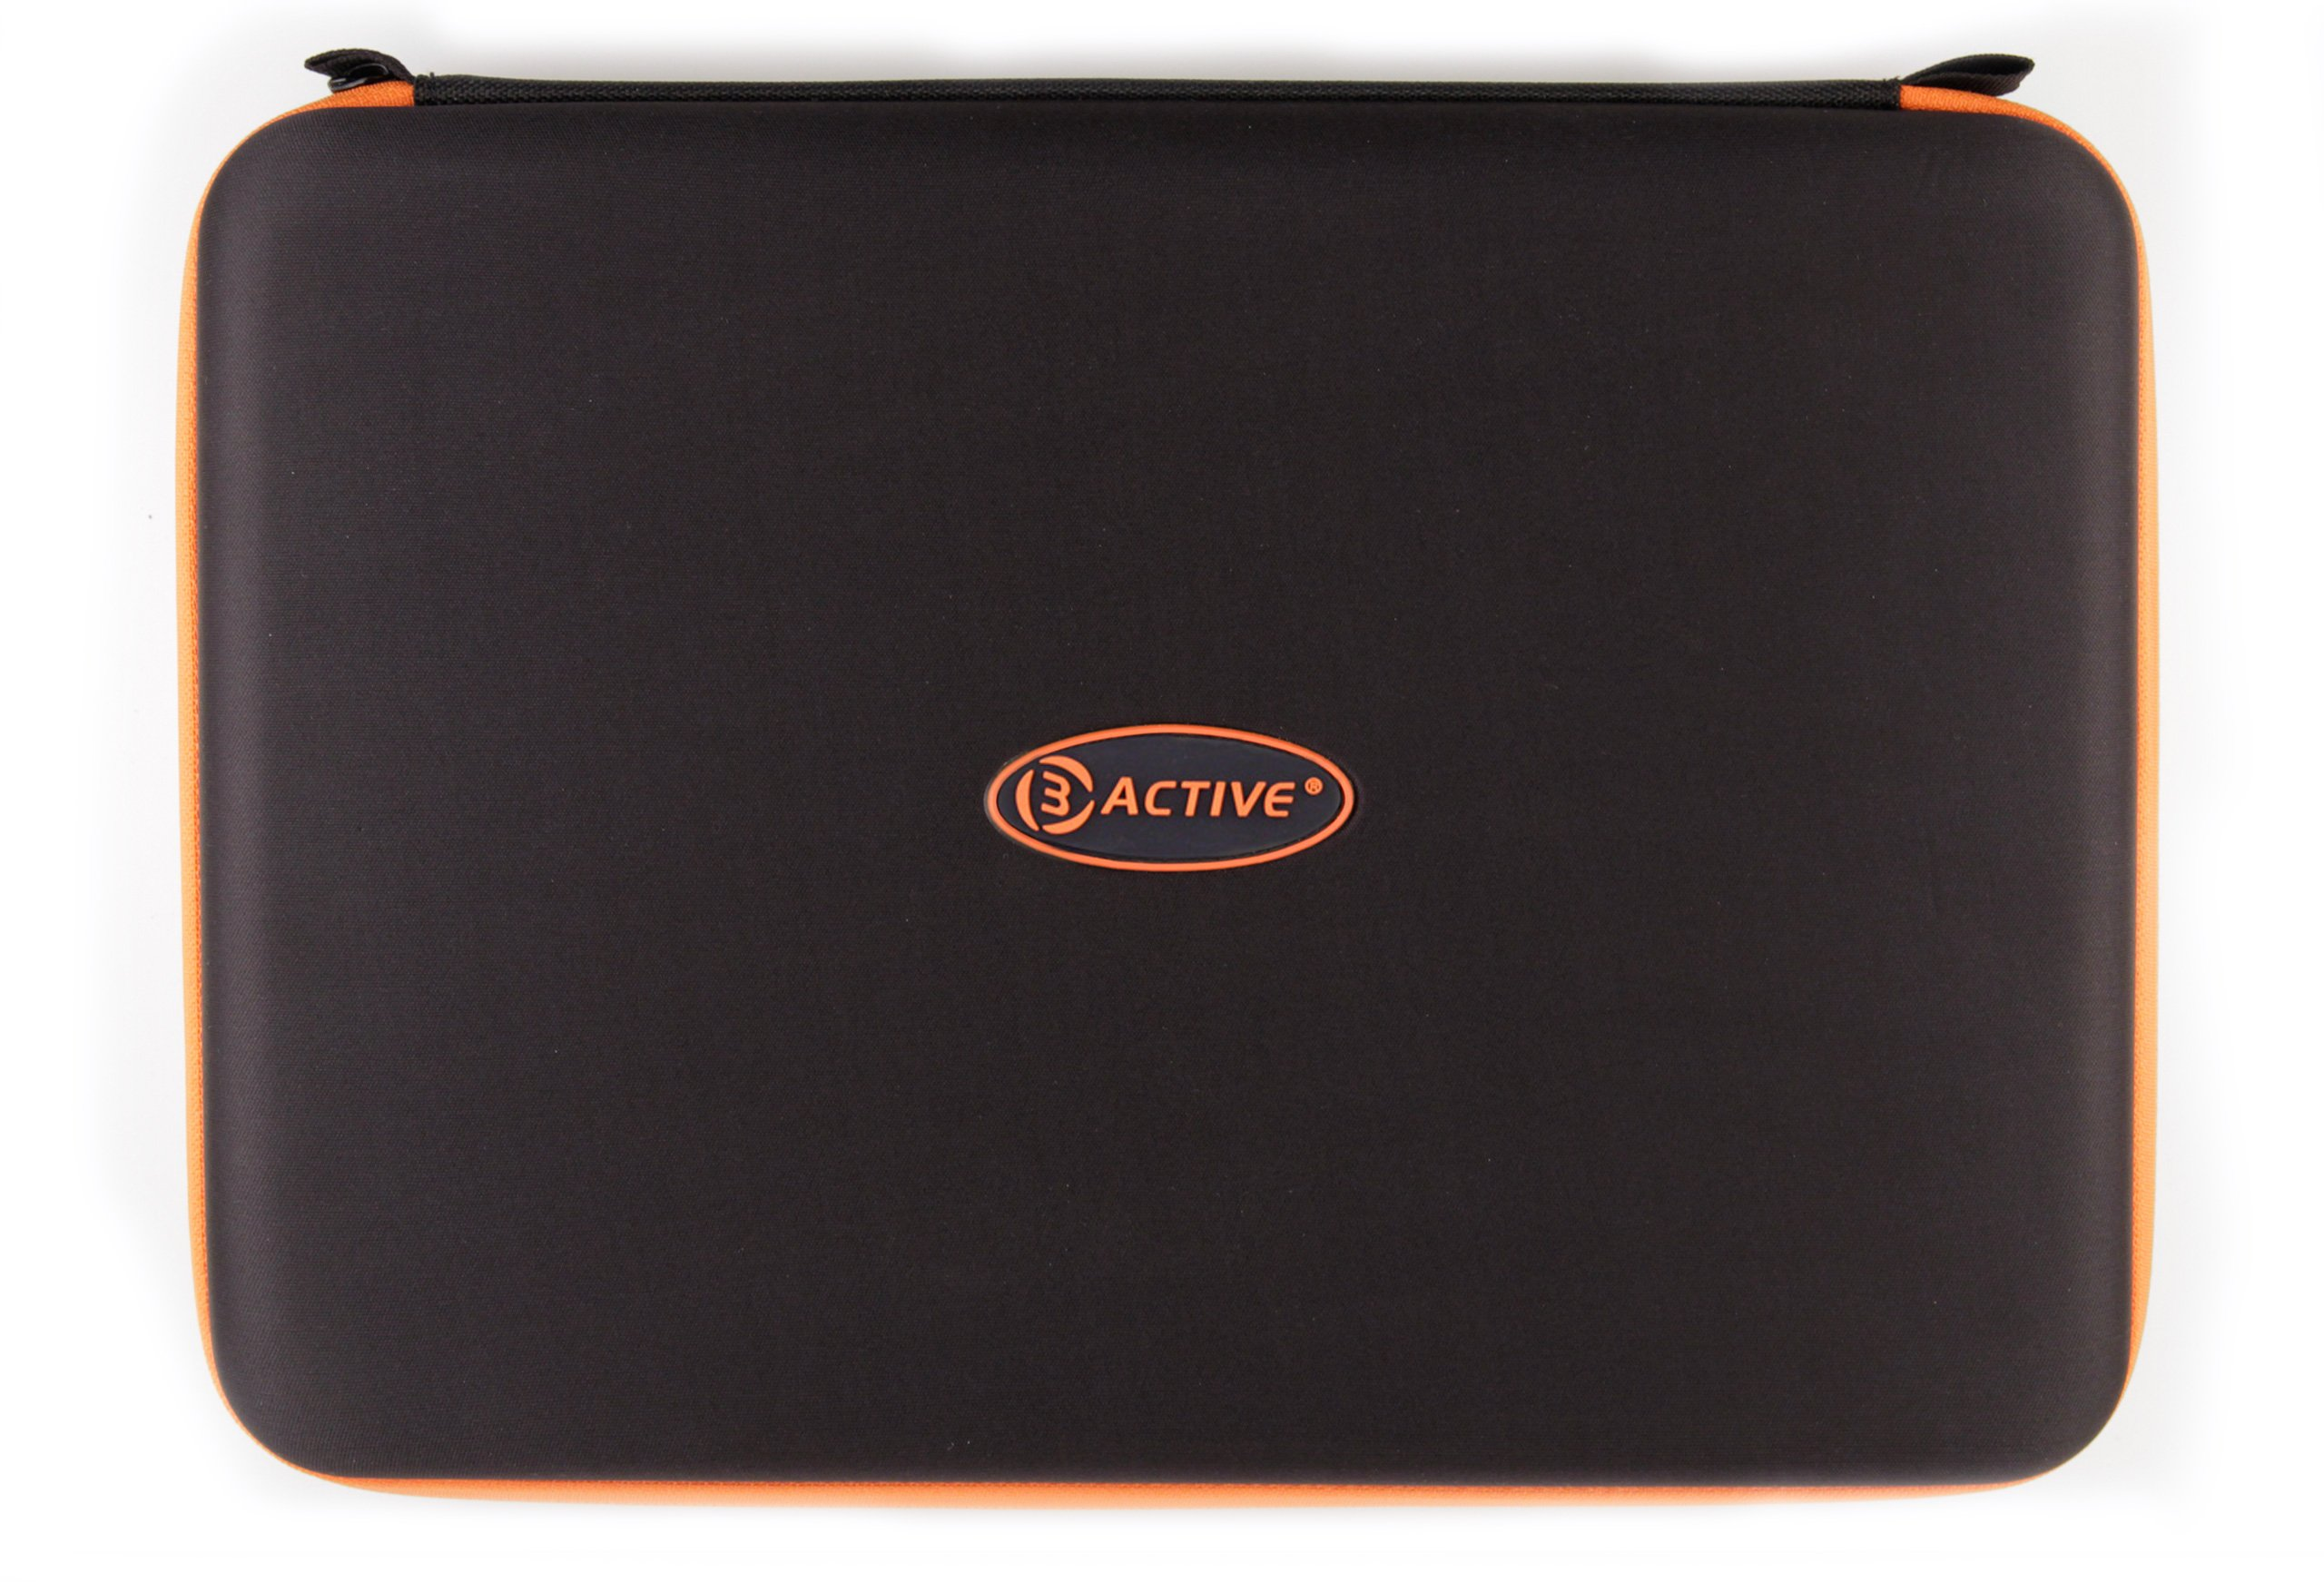 3ACTIVE Premium Four-Pack Storage Case by 3ACTIVE